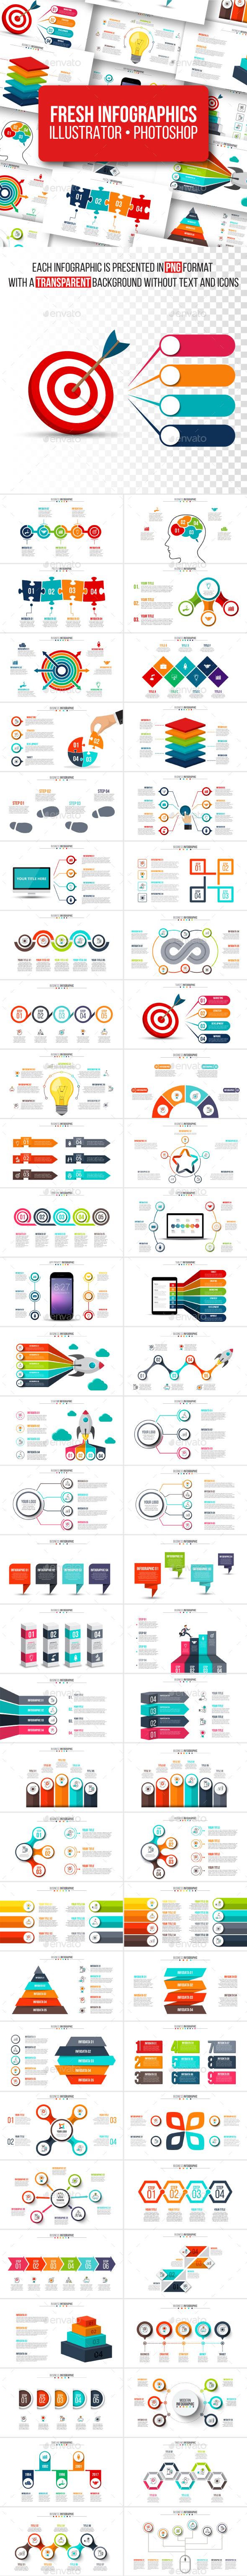 Fresh infographics pack - Infographics